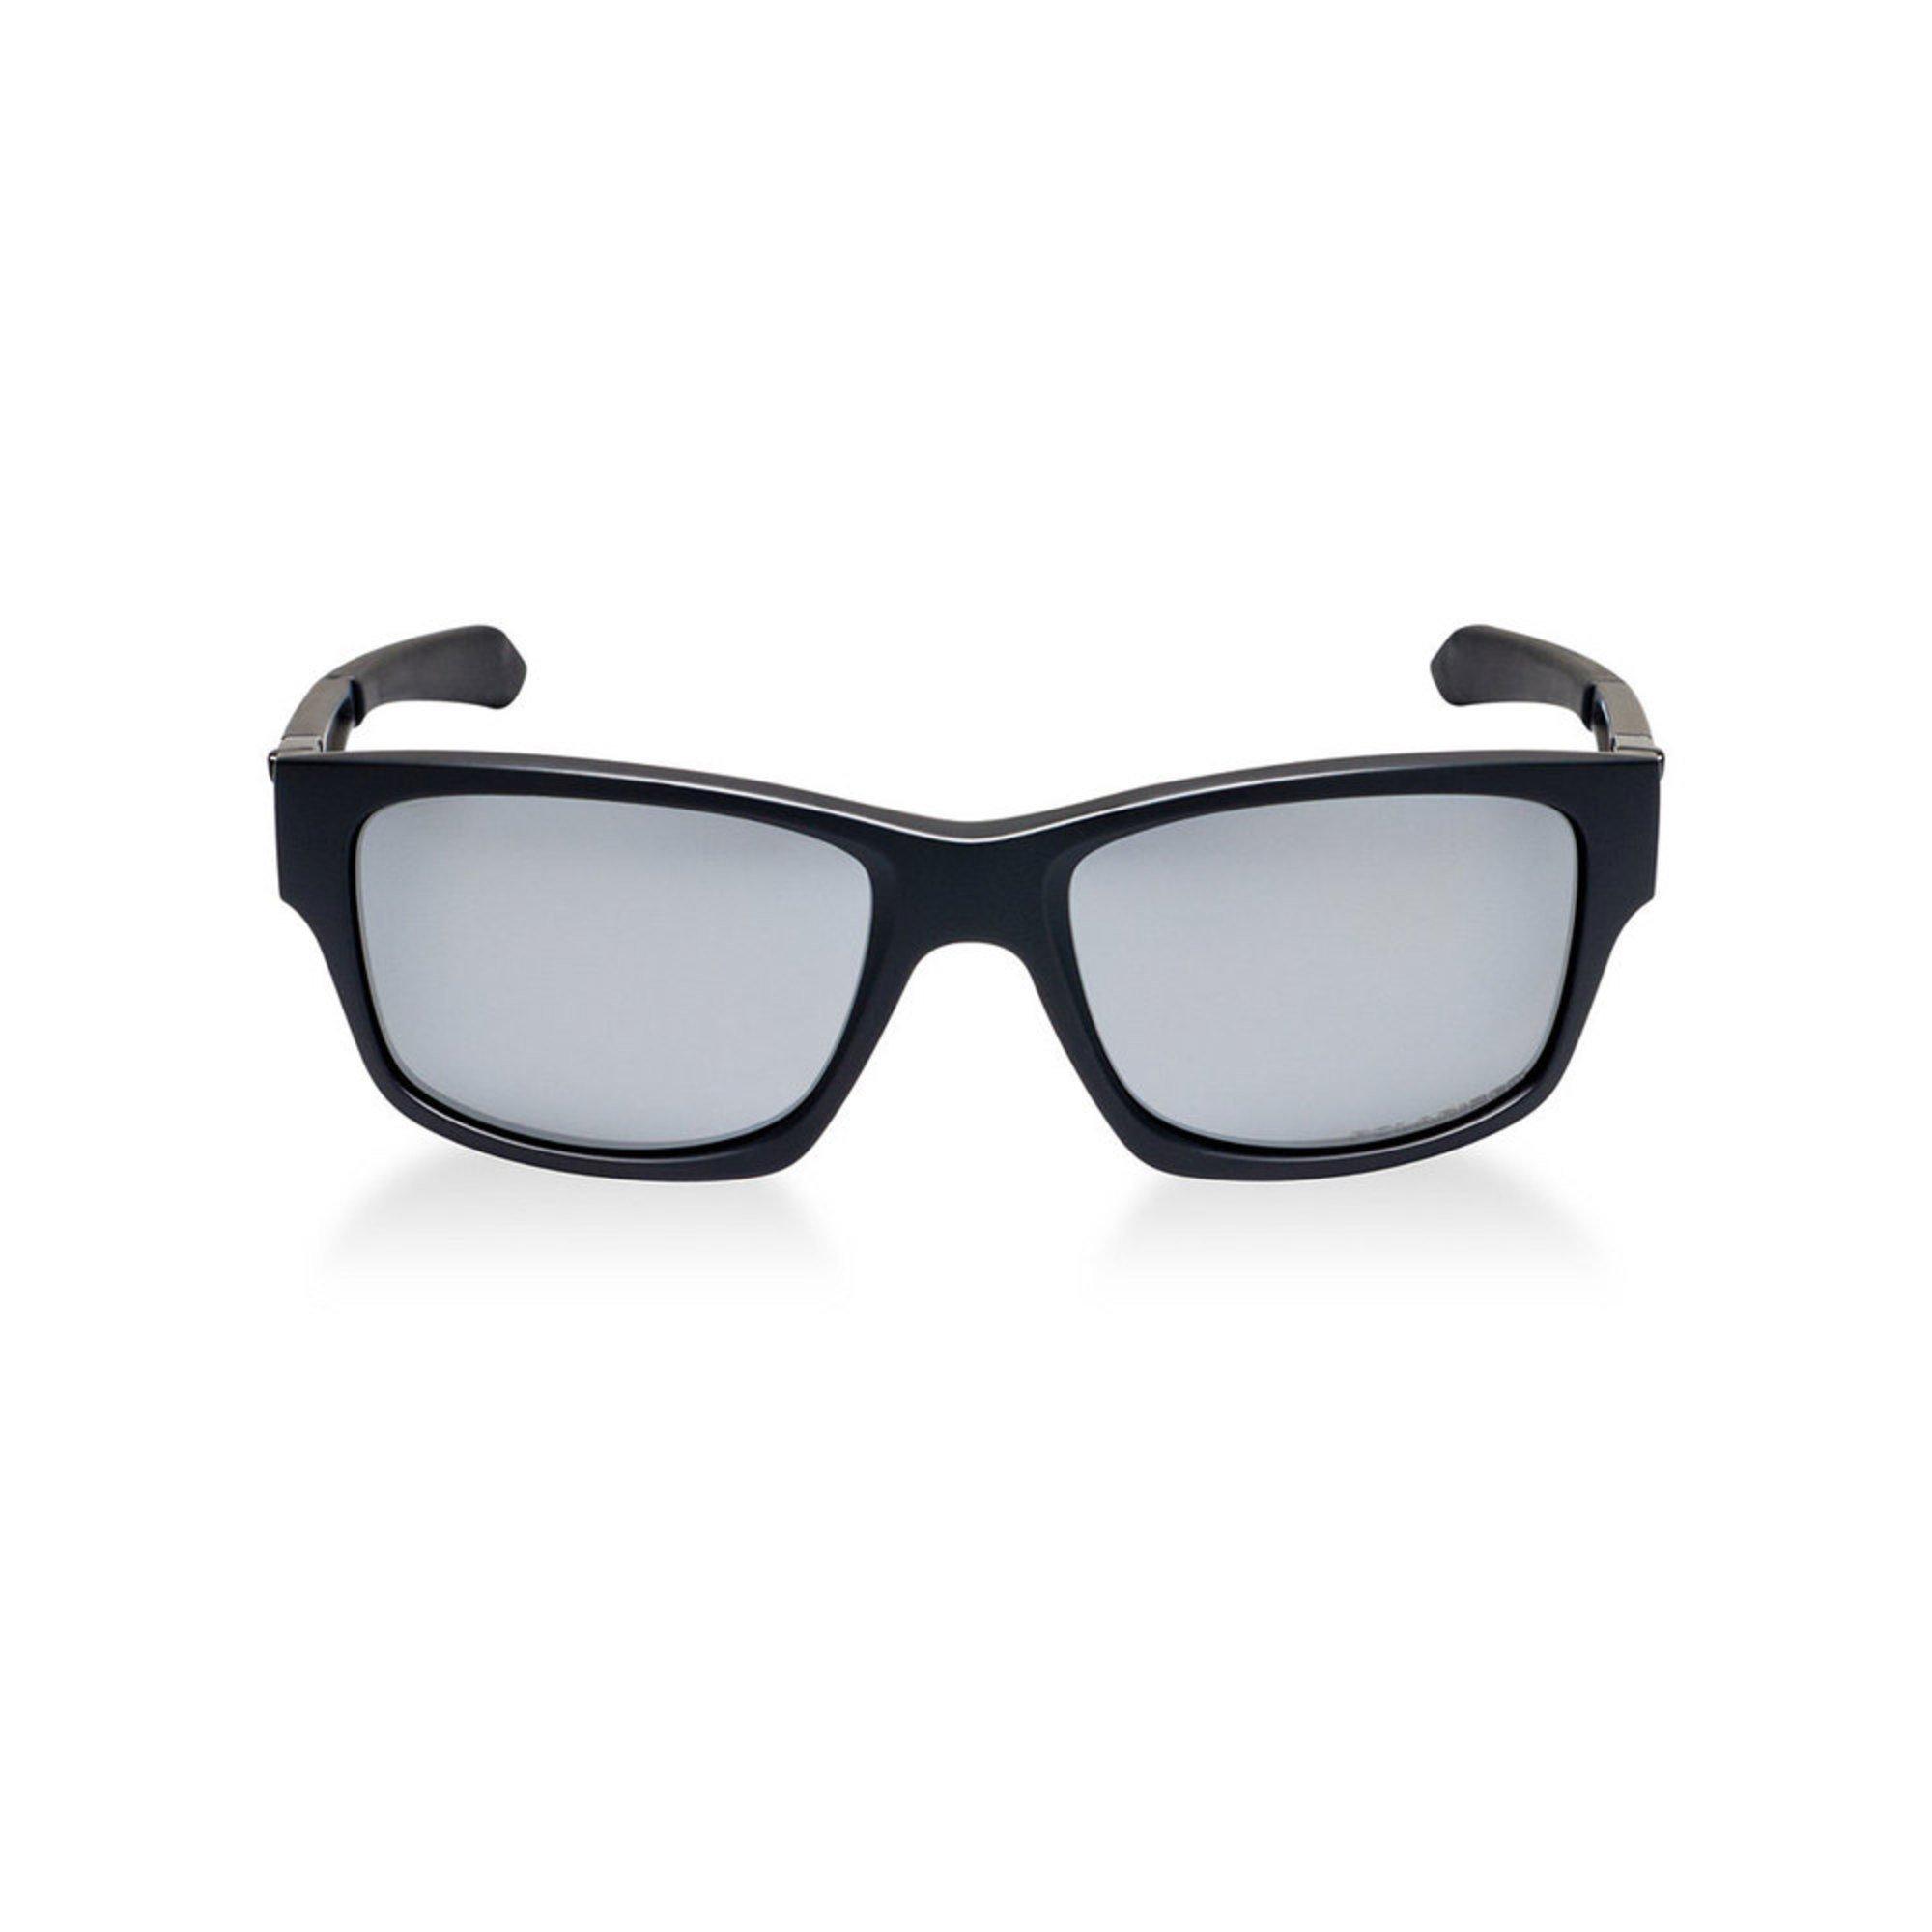 81b4872d40 Oakley. Oakley Men s Polarized Jupiter Squared Sunglasses